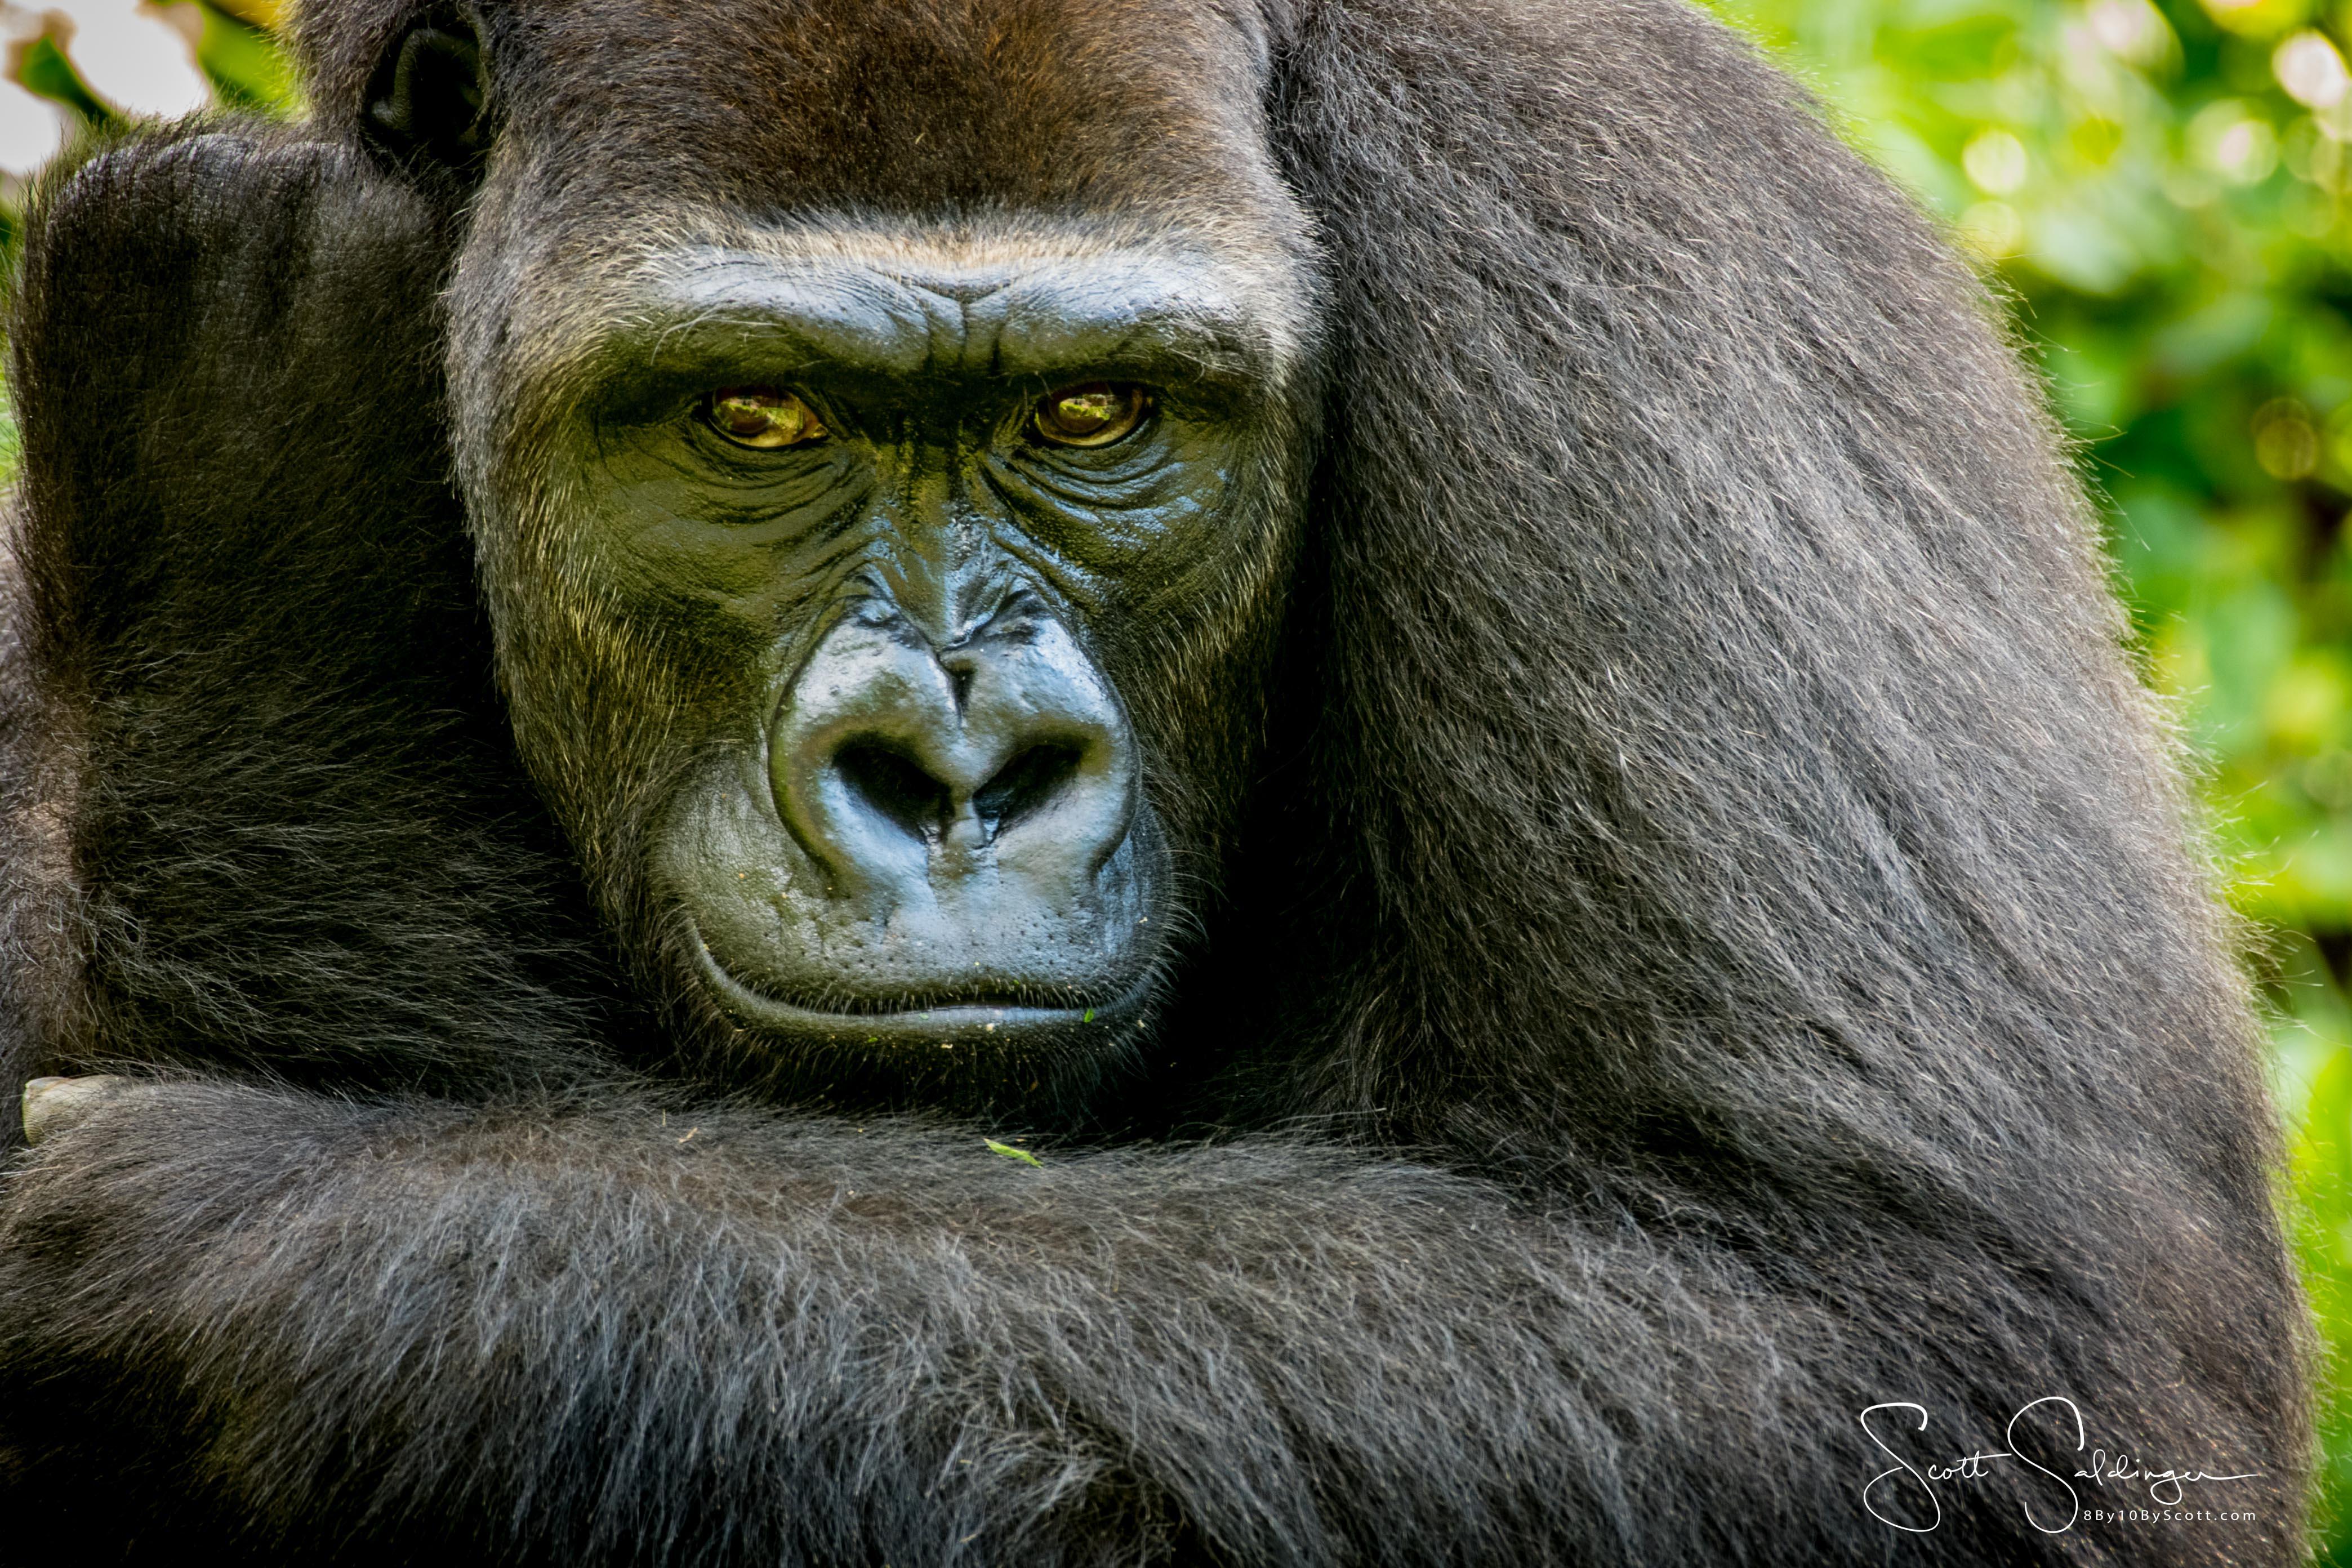 Apes-5658